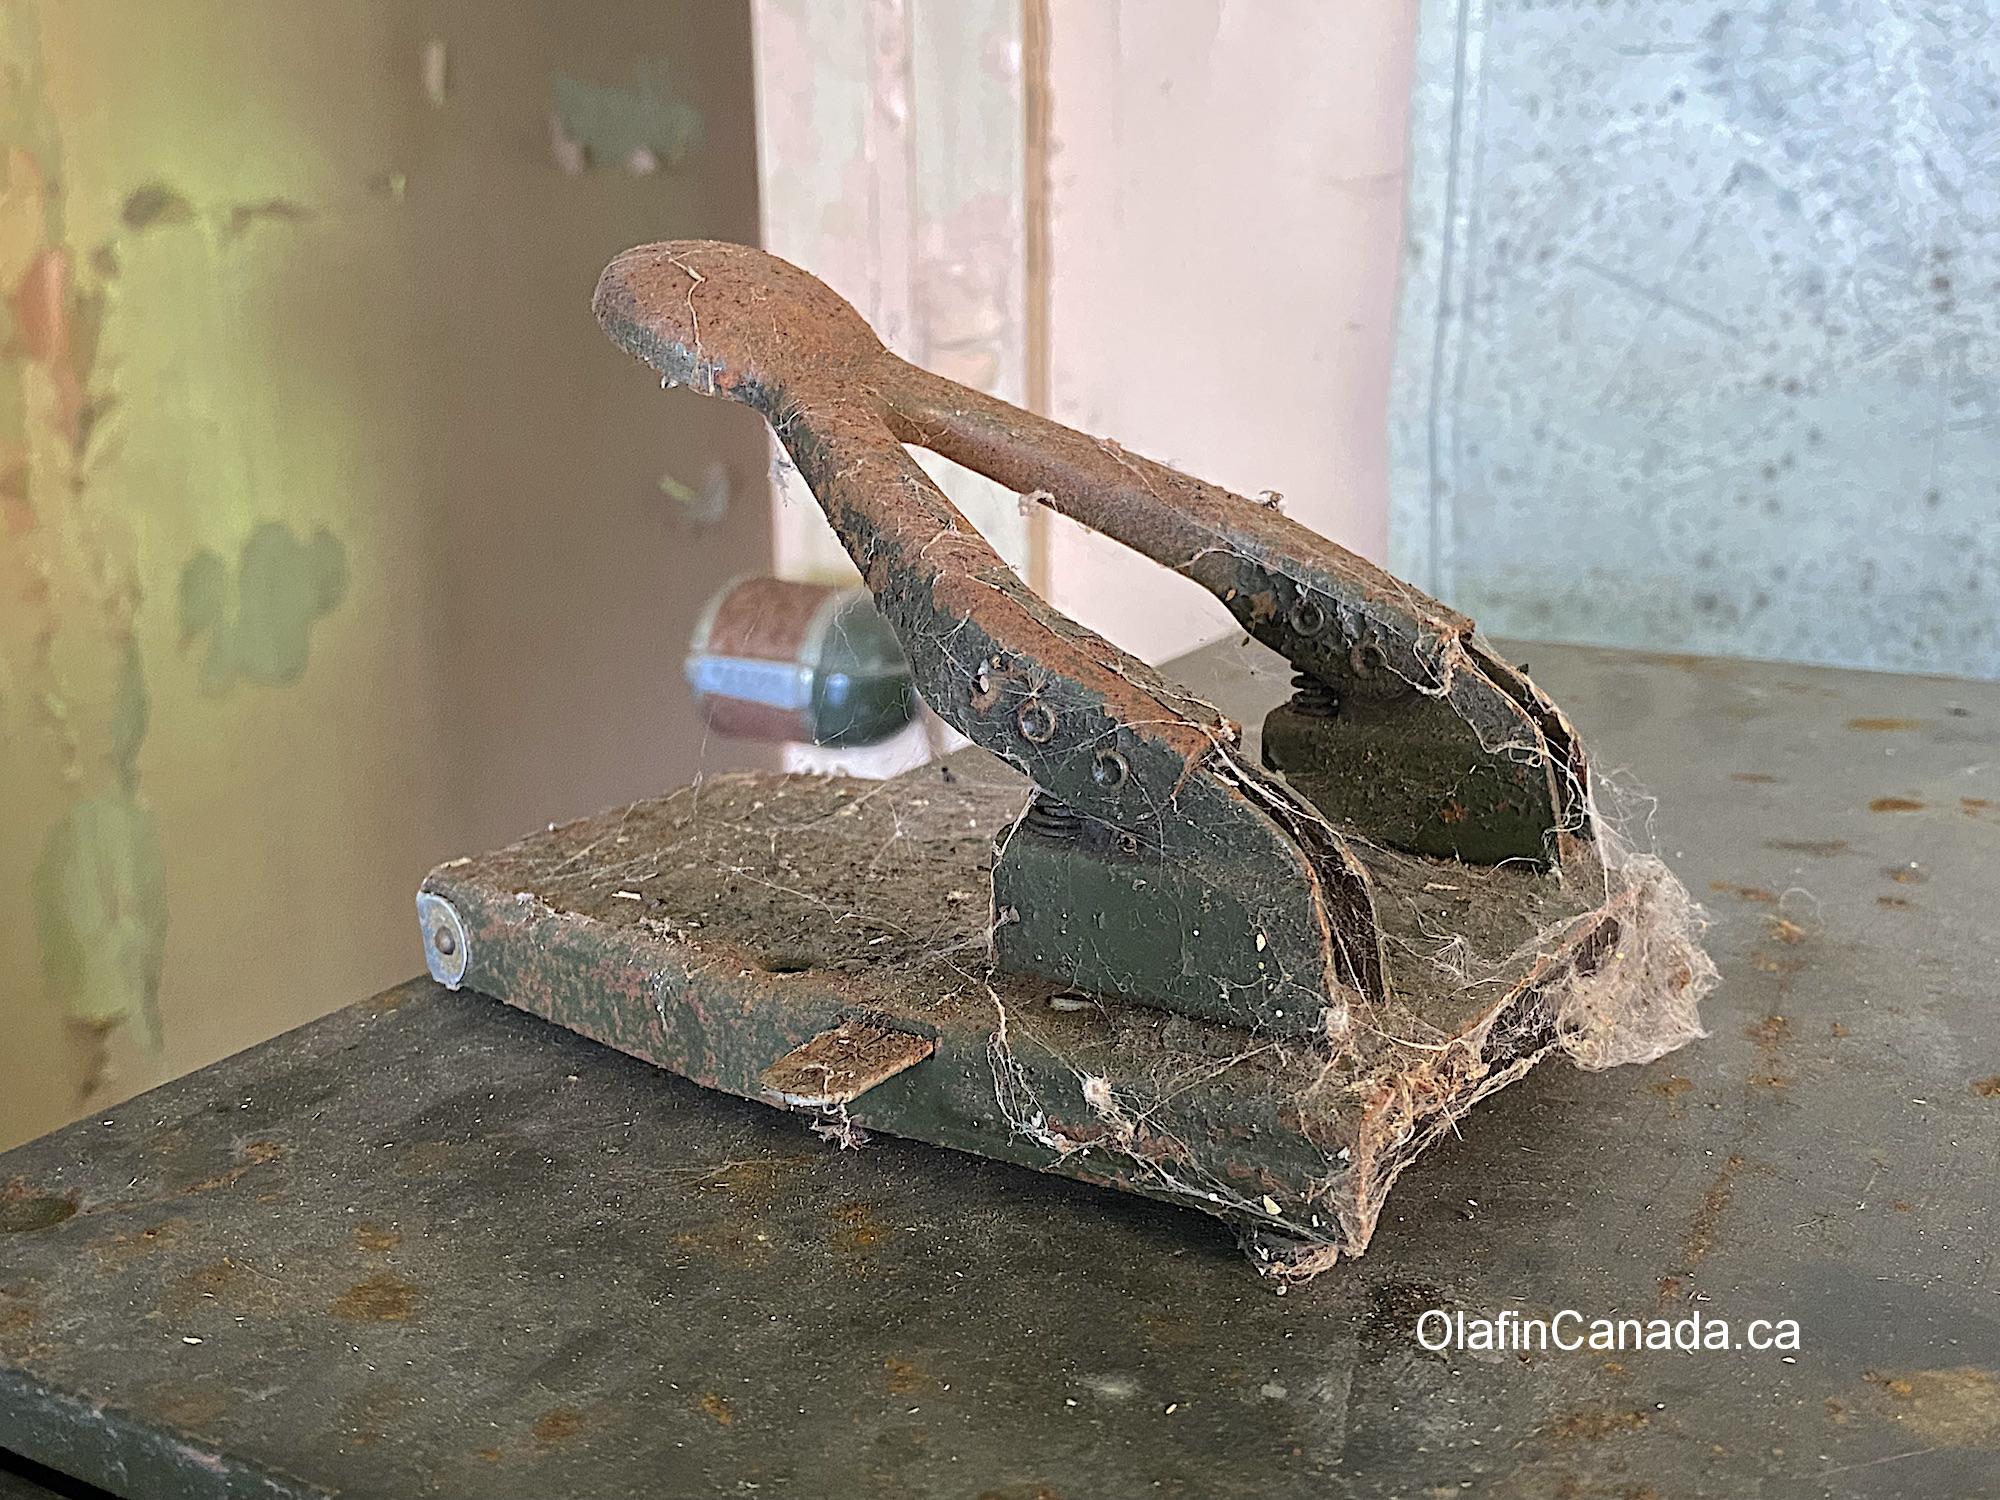 A hole puncher full of cobwebs in the office #olafincanada #britishcolumbia #discoverbc #abandonedbc #tallheocannery #bellacoola